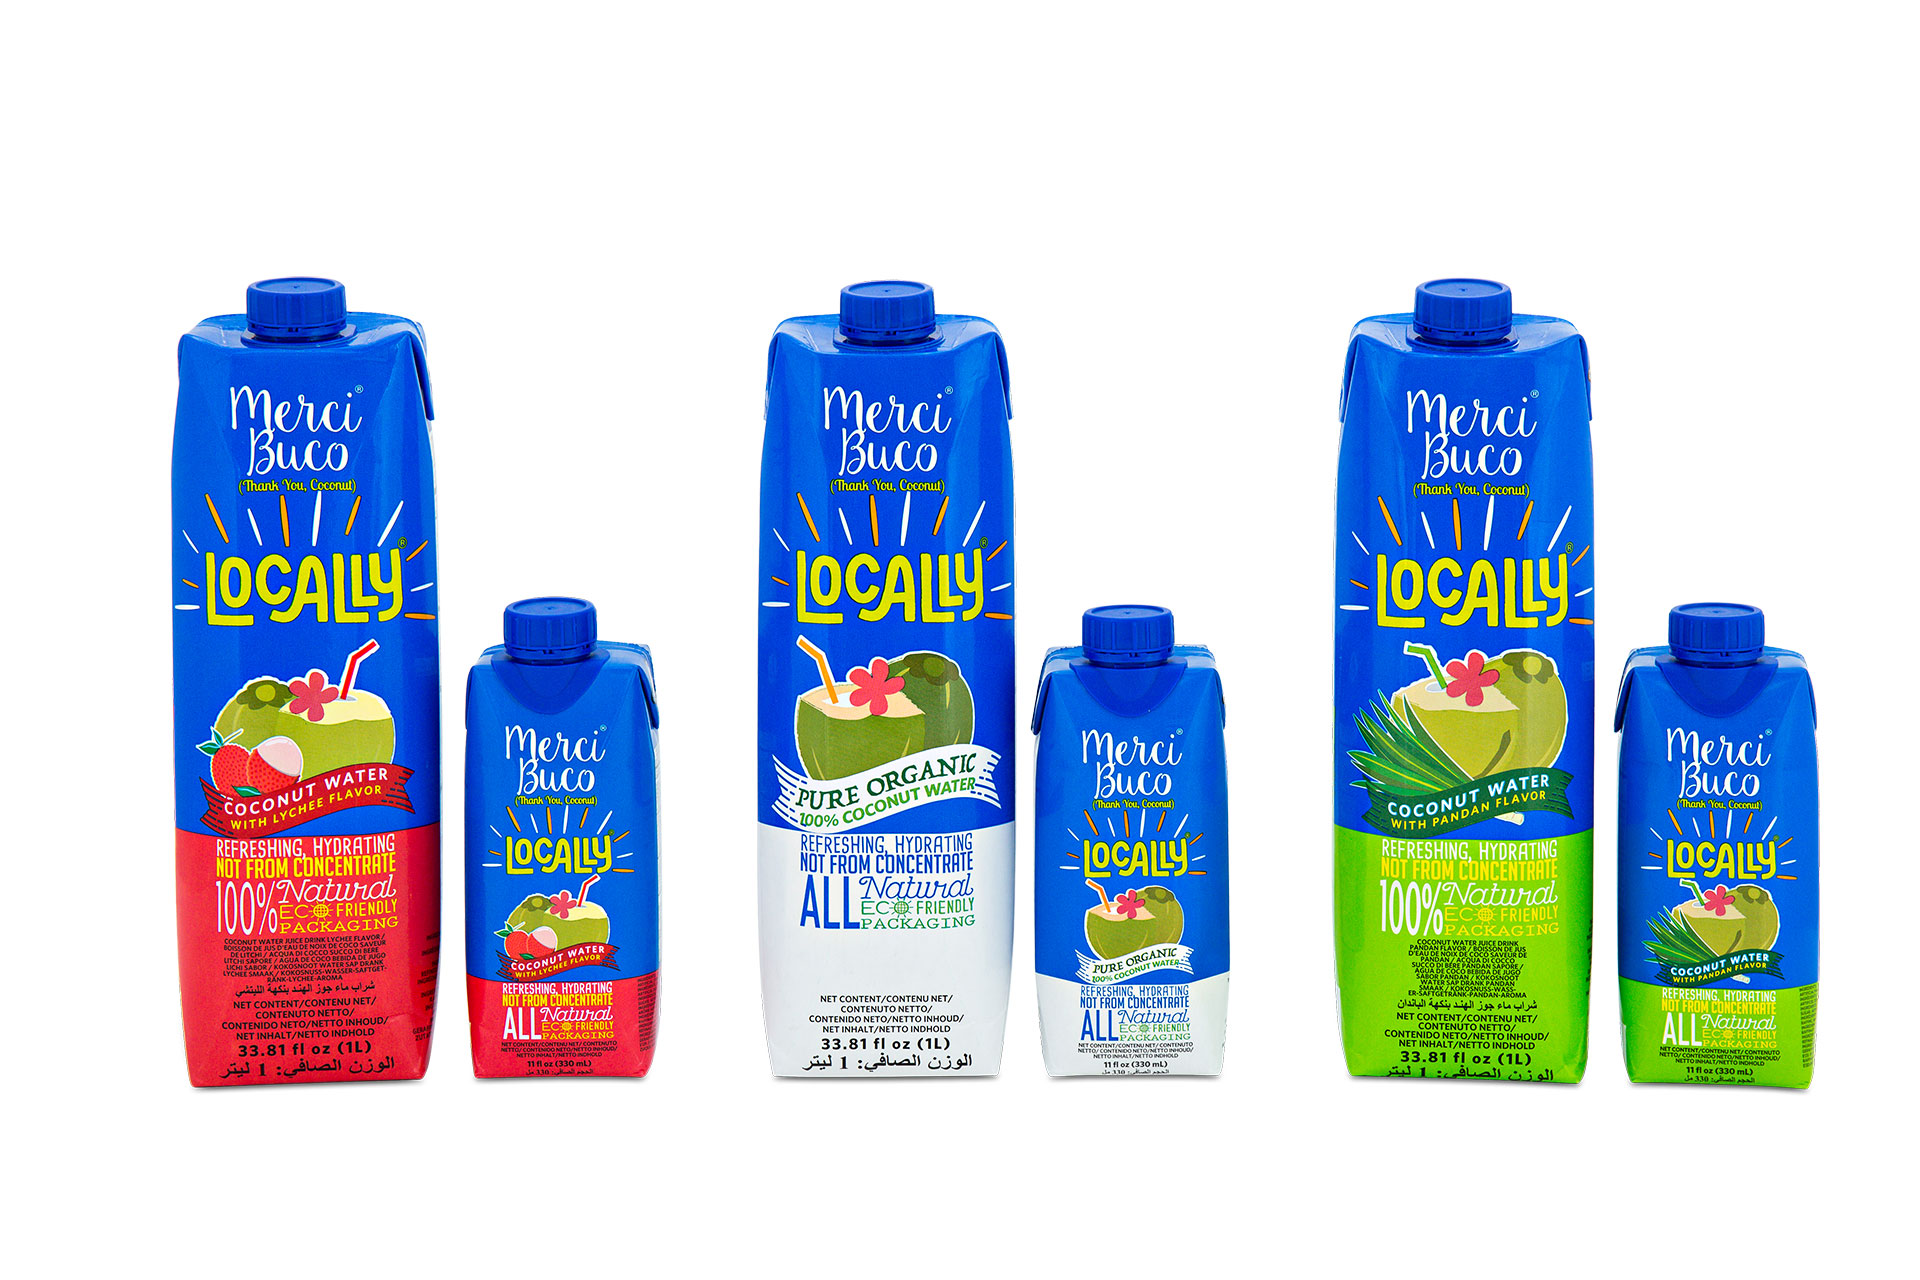 4 Locally Blended Juice Drink Review Photos - Gen-zel She Sings Beauty